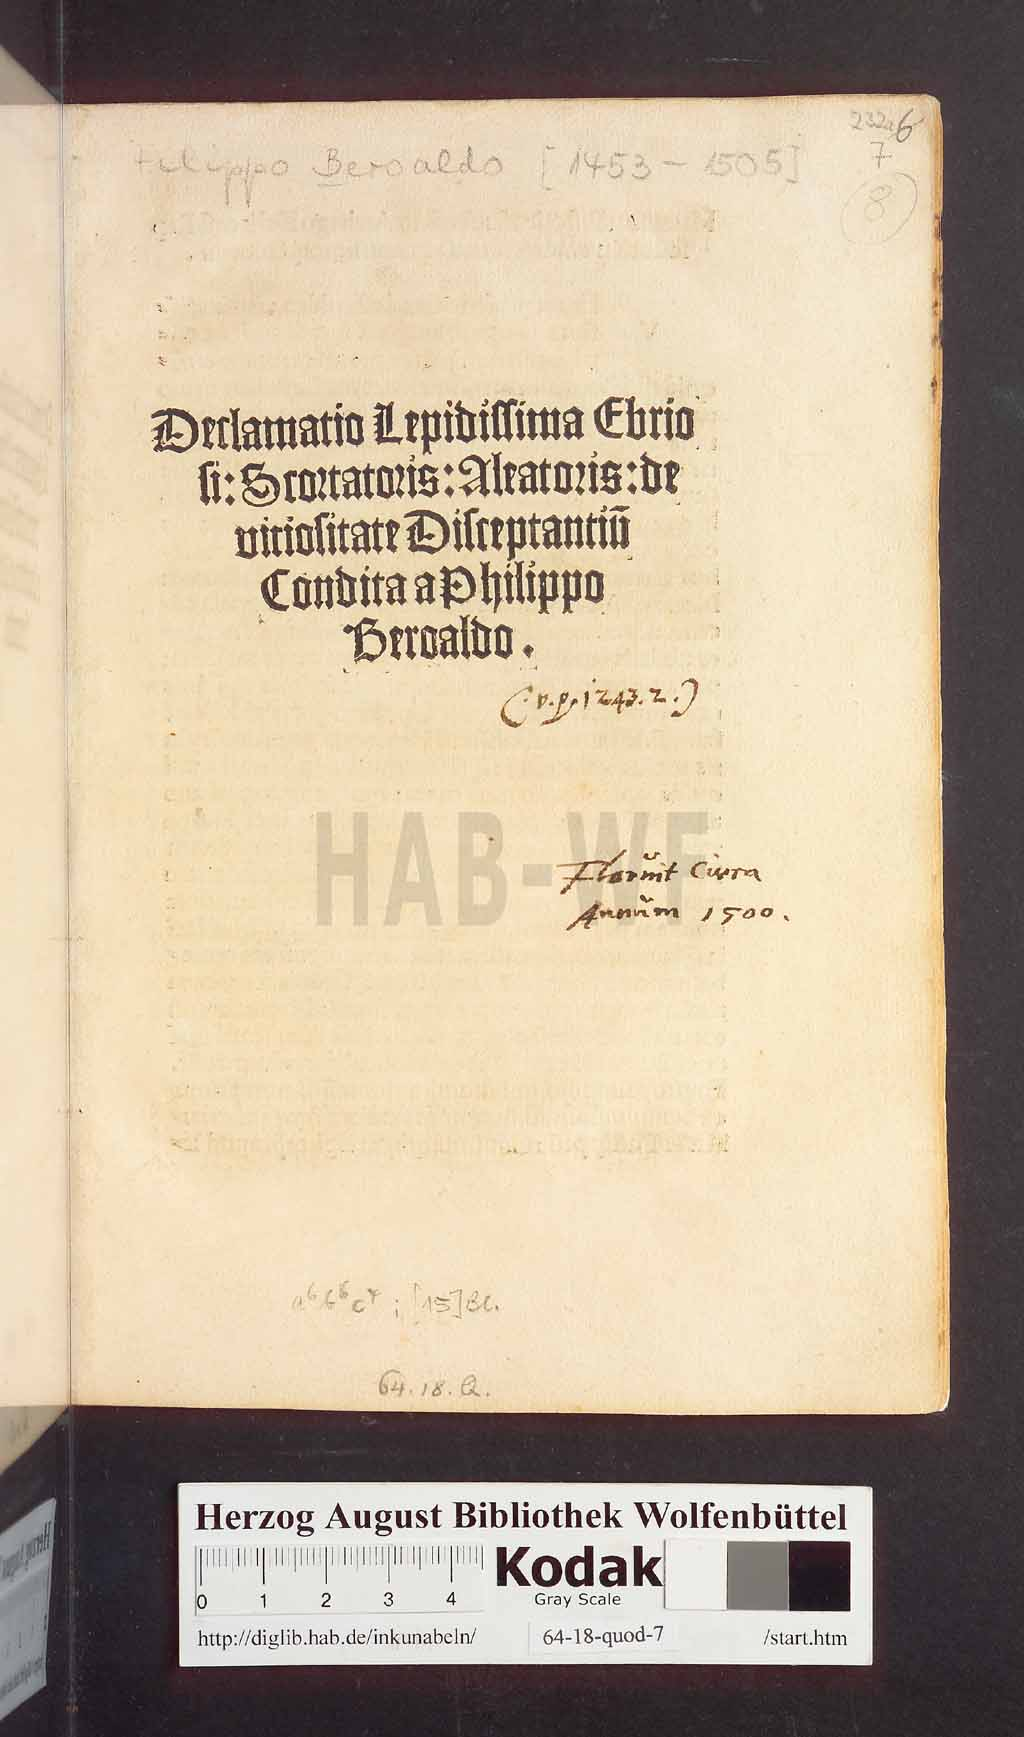 http://diglib.hab.de/drucke/64-18-quod-7/00001.jpg